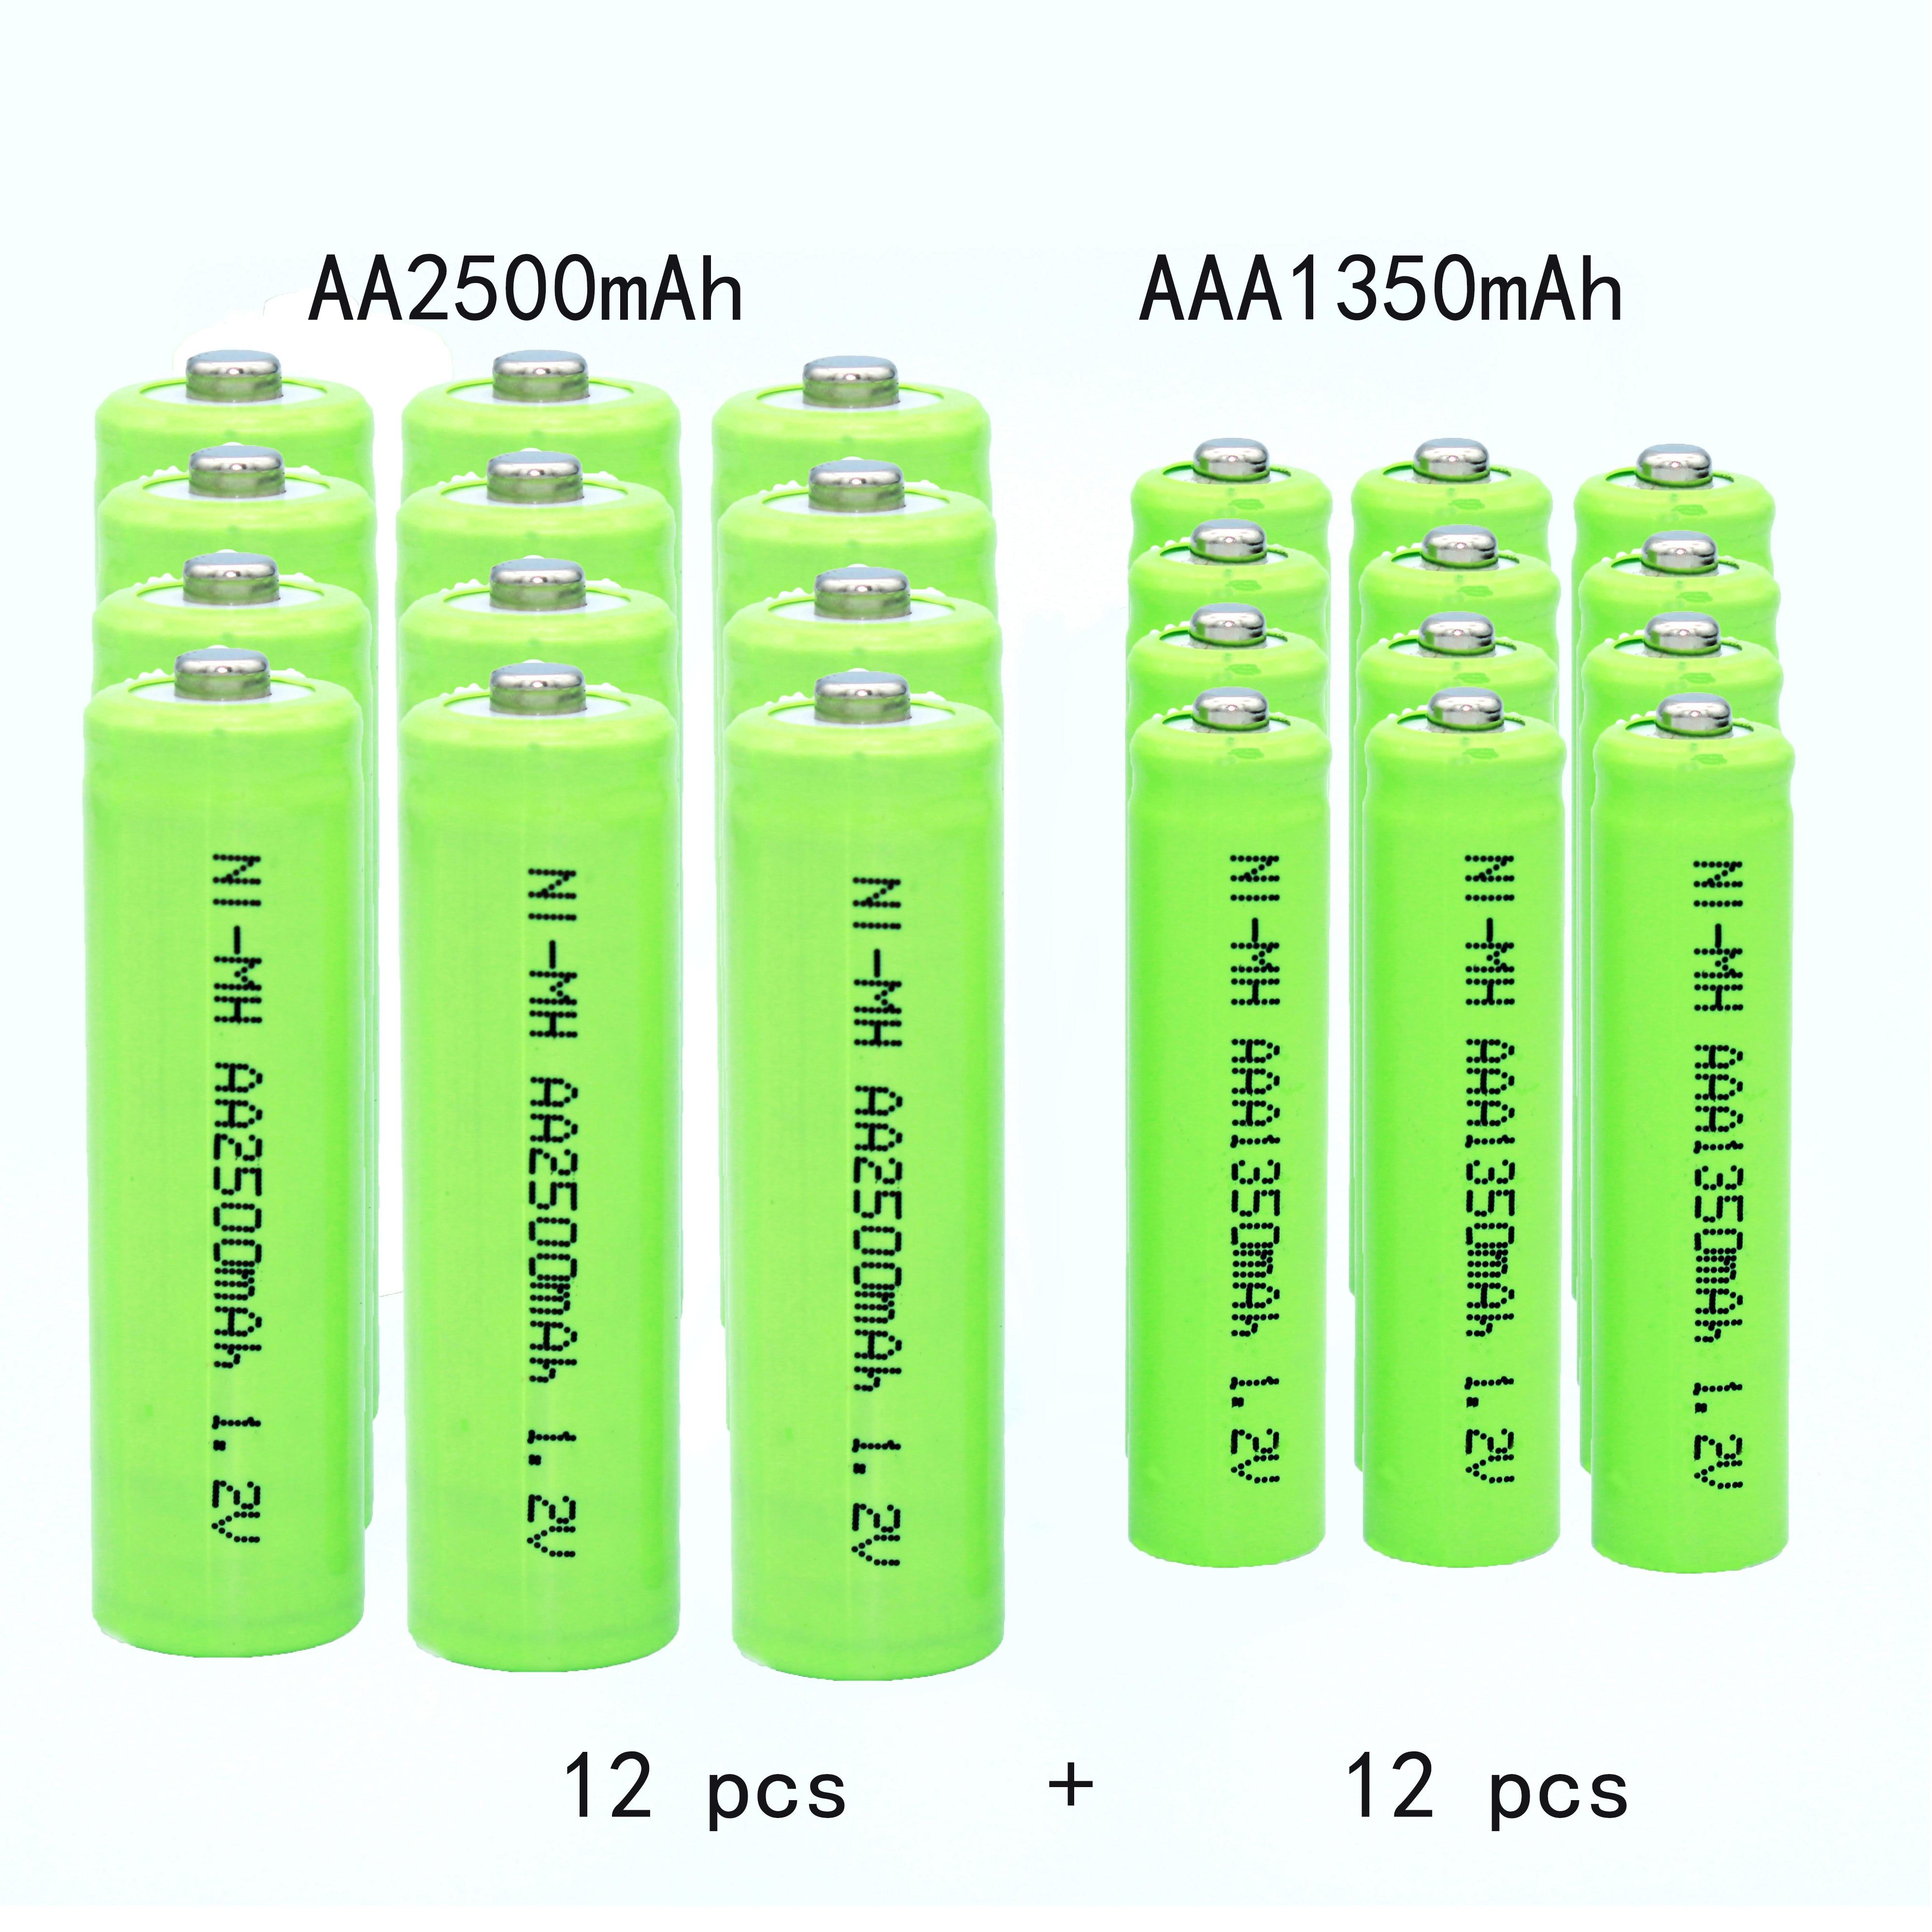 Batería alcalina original recargable AA, 1,2 v, 2500mah, AAA1350mah, linternas, brinquedos, sustitución...